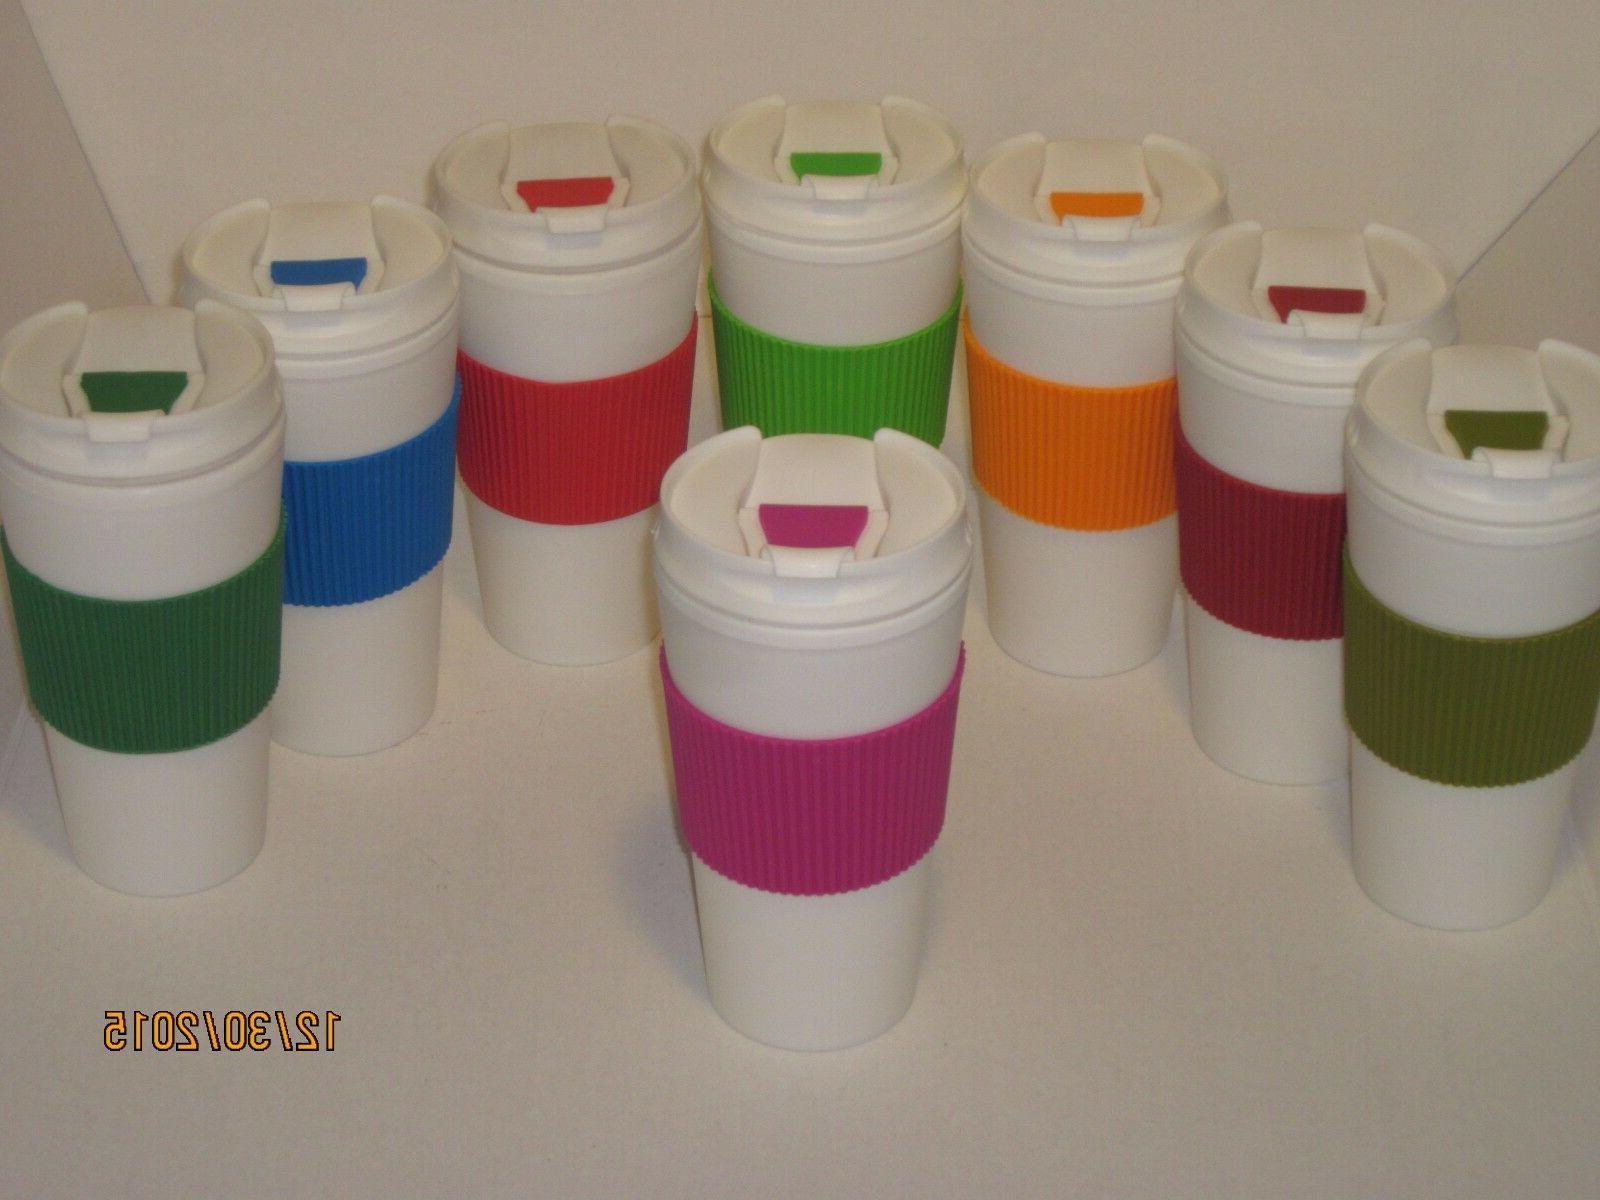 Thermal 16oz Travel Mug - Go, Coffee Cup, Mug, Thermos,